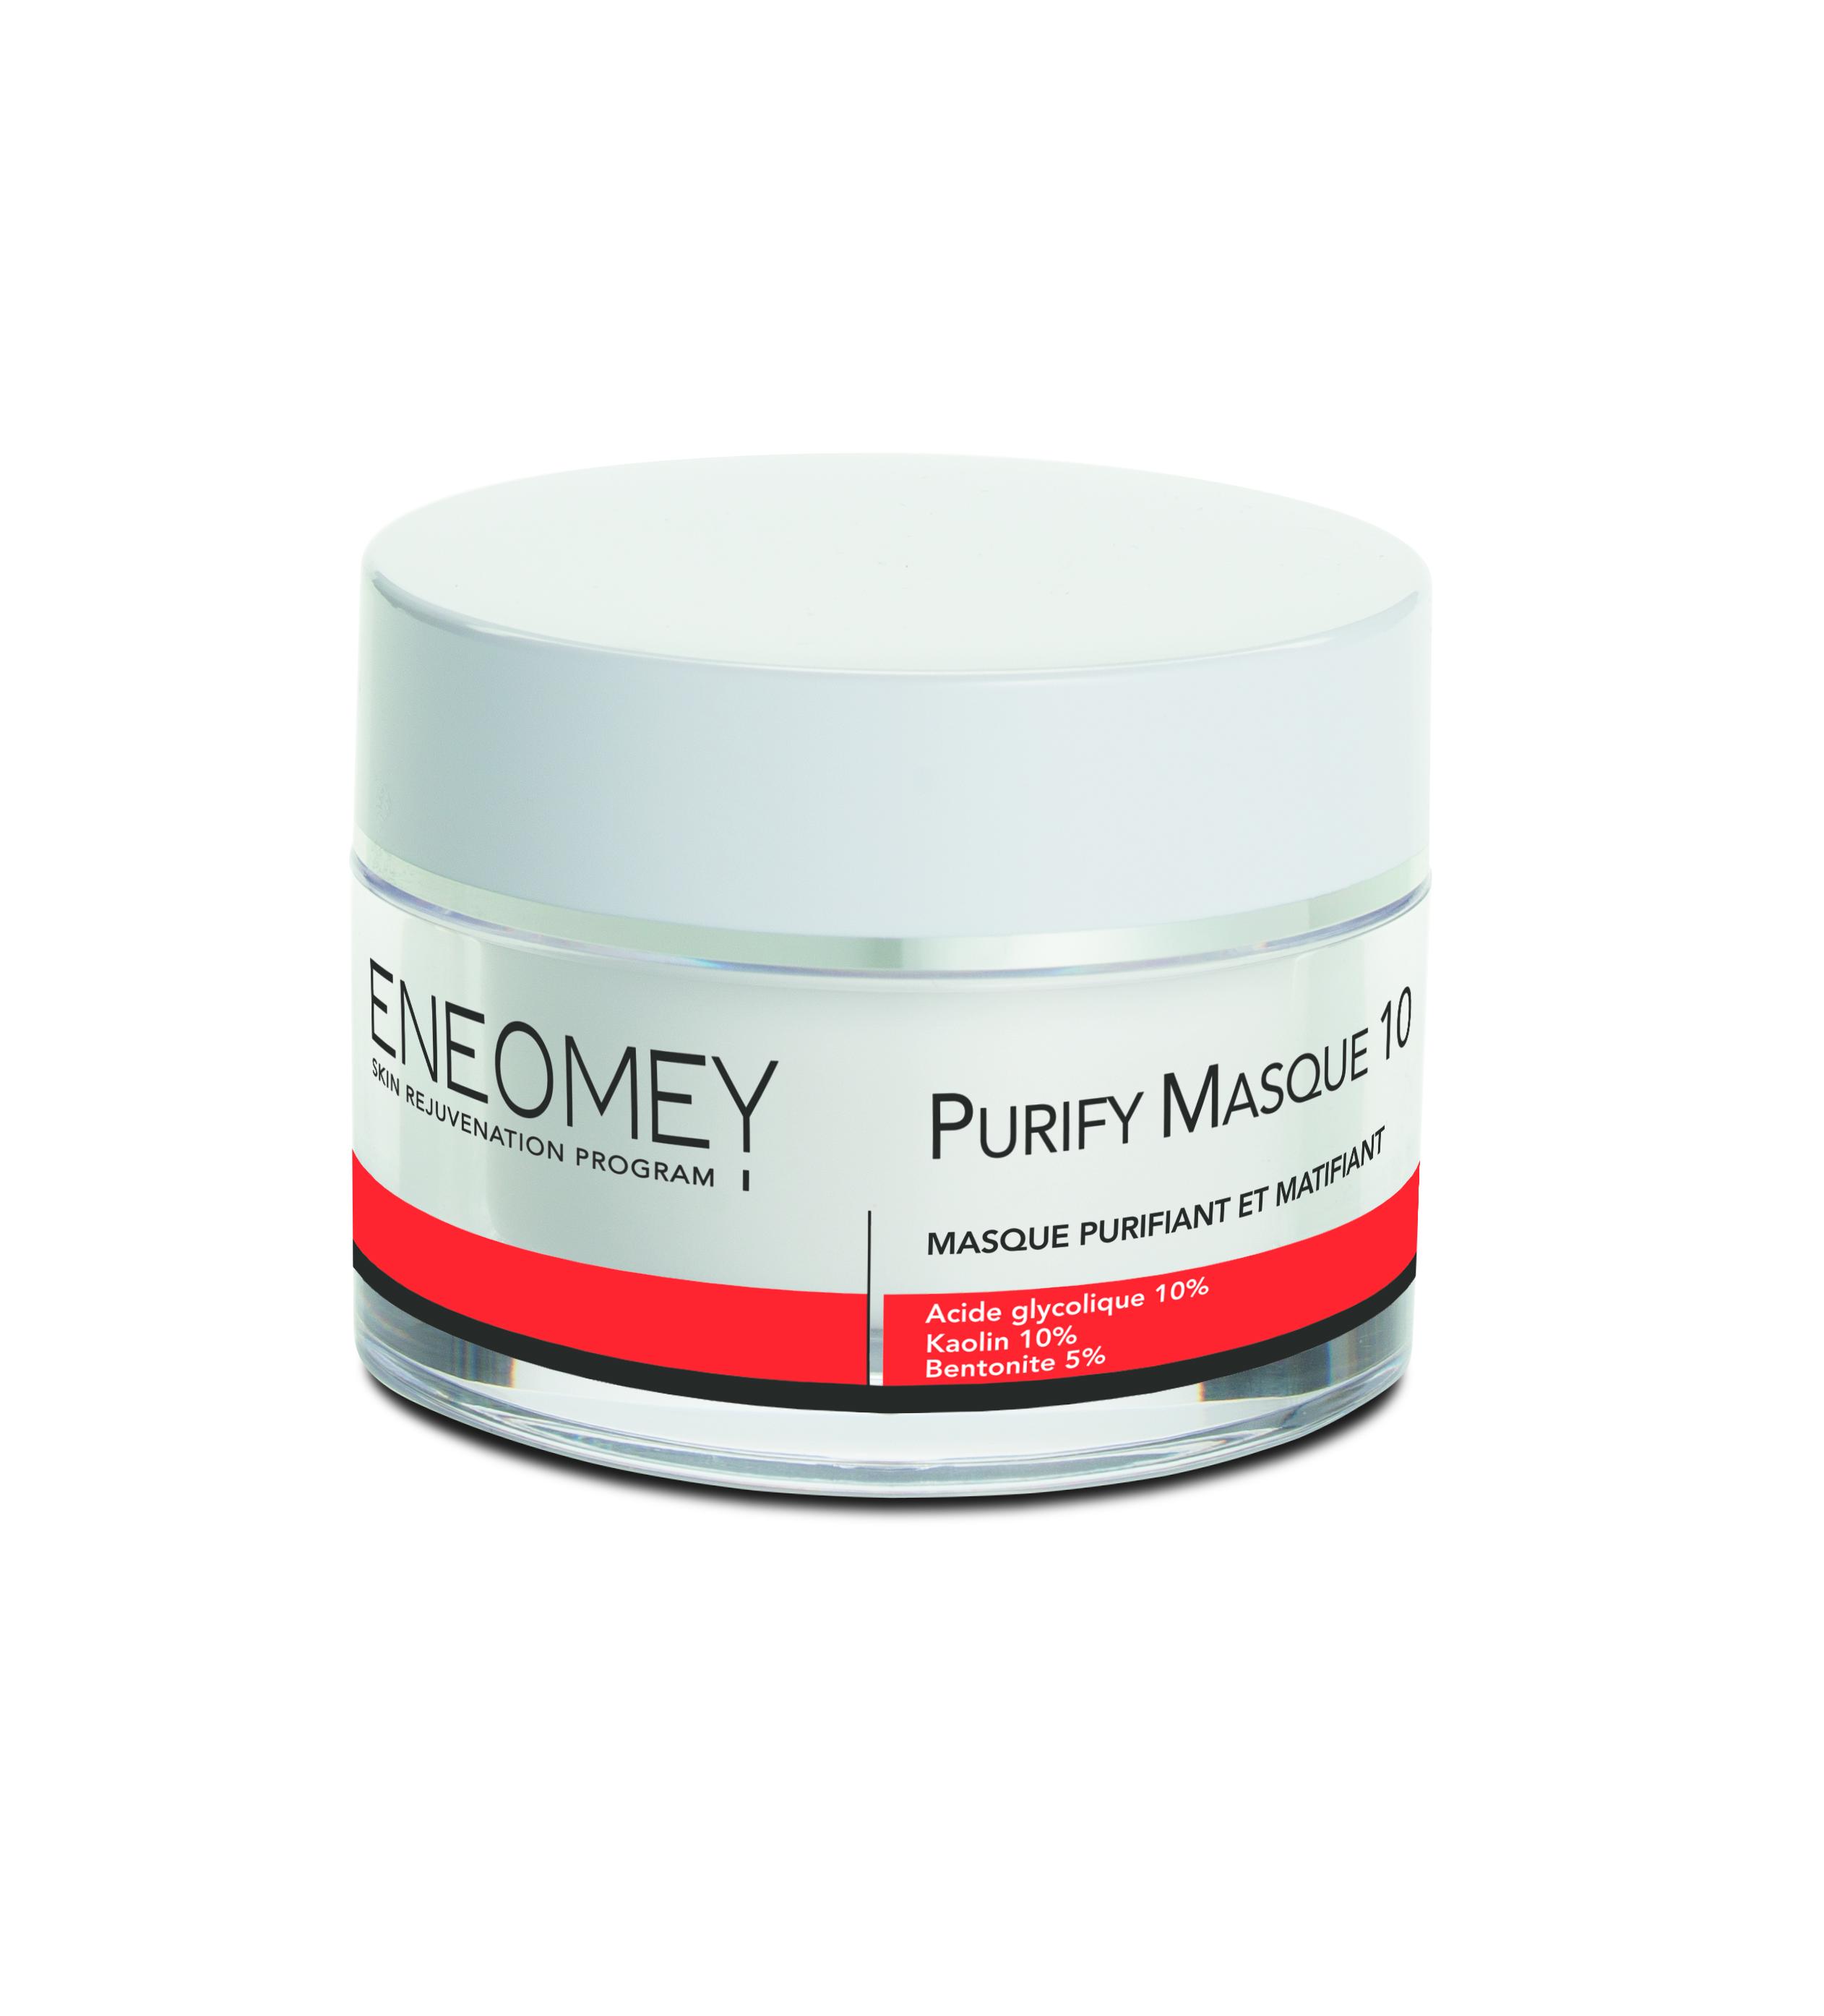 Purify Masque 10 50 ml Purify Masque 10 % 50ml